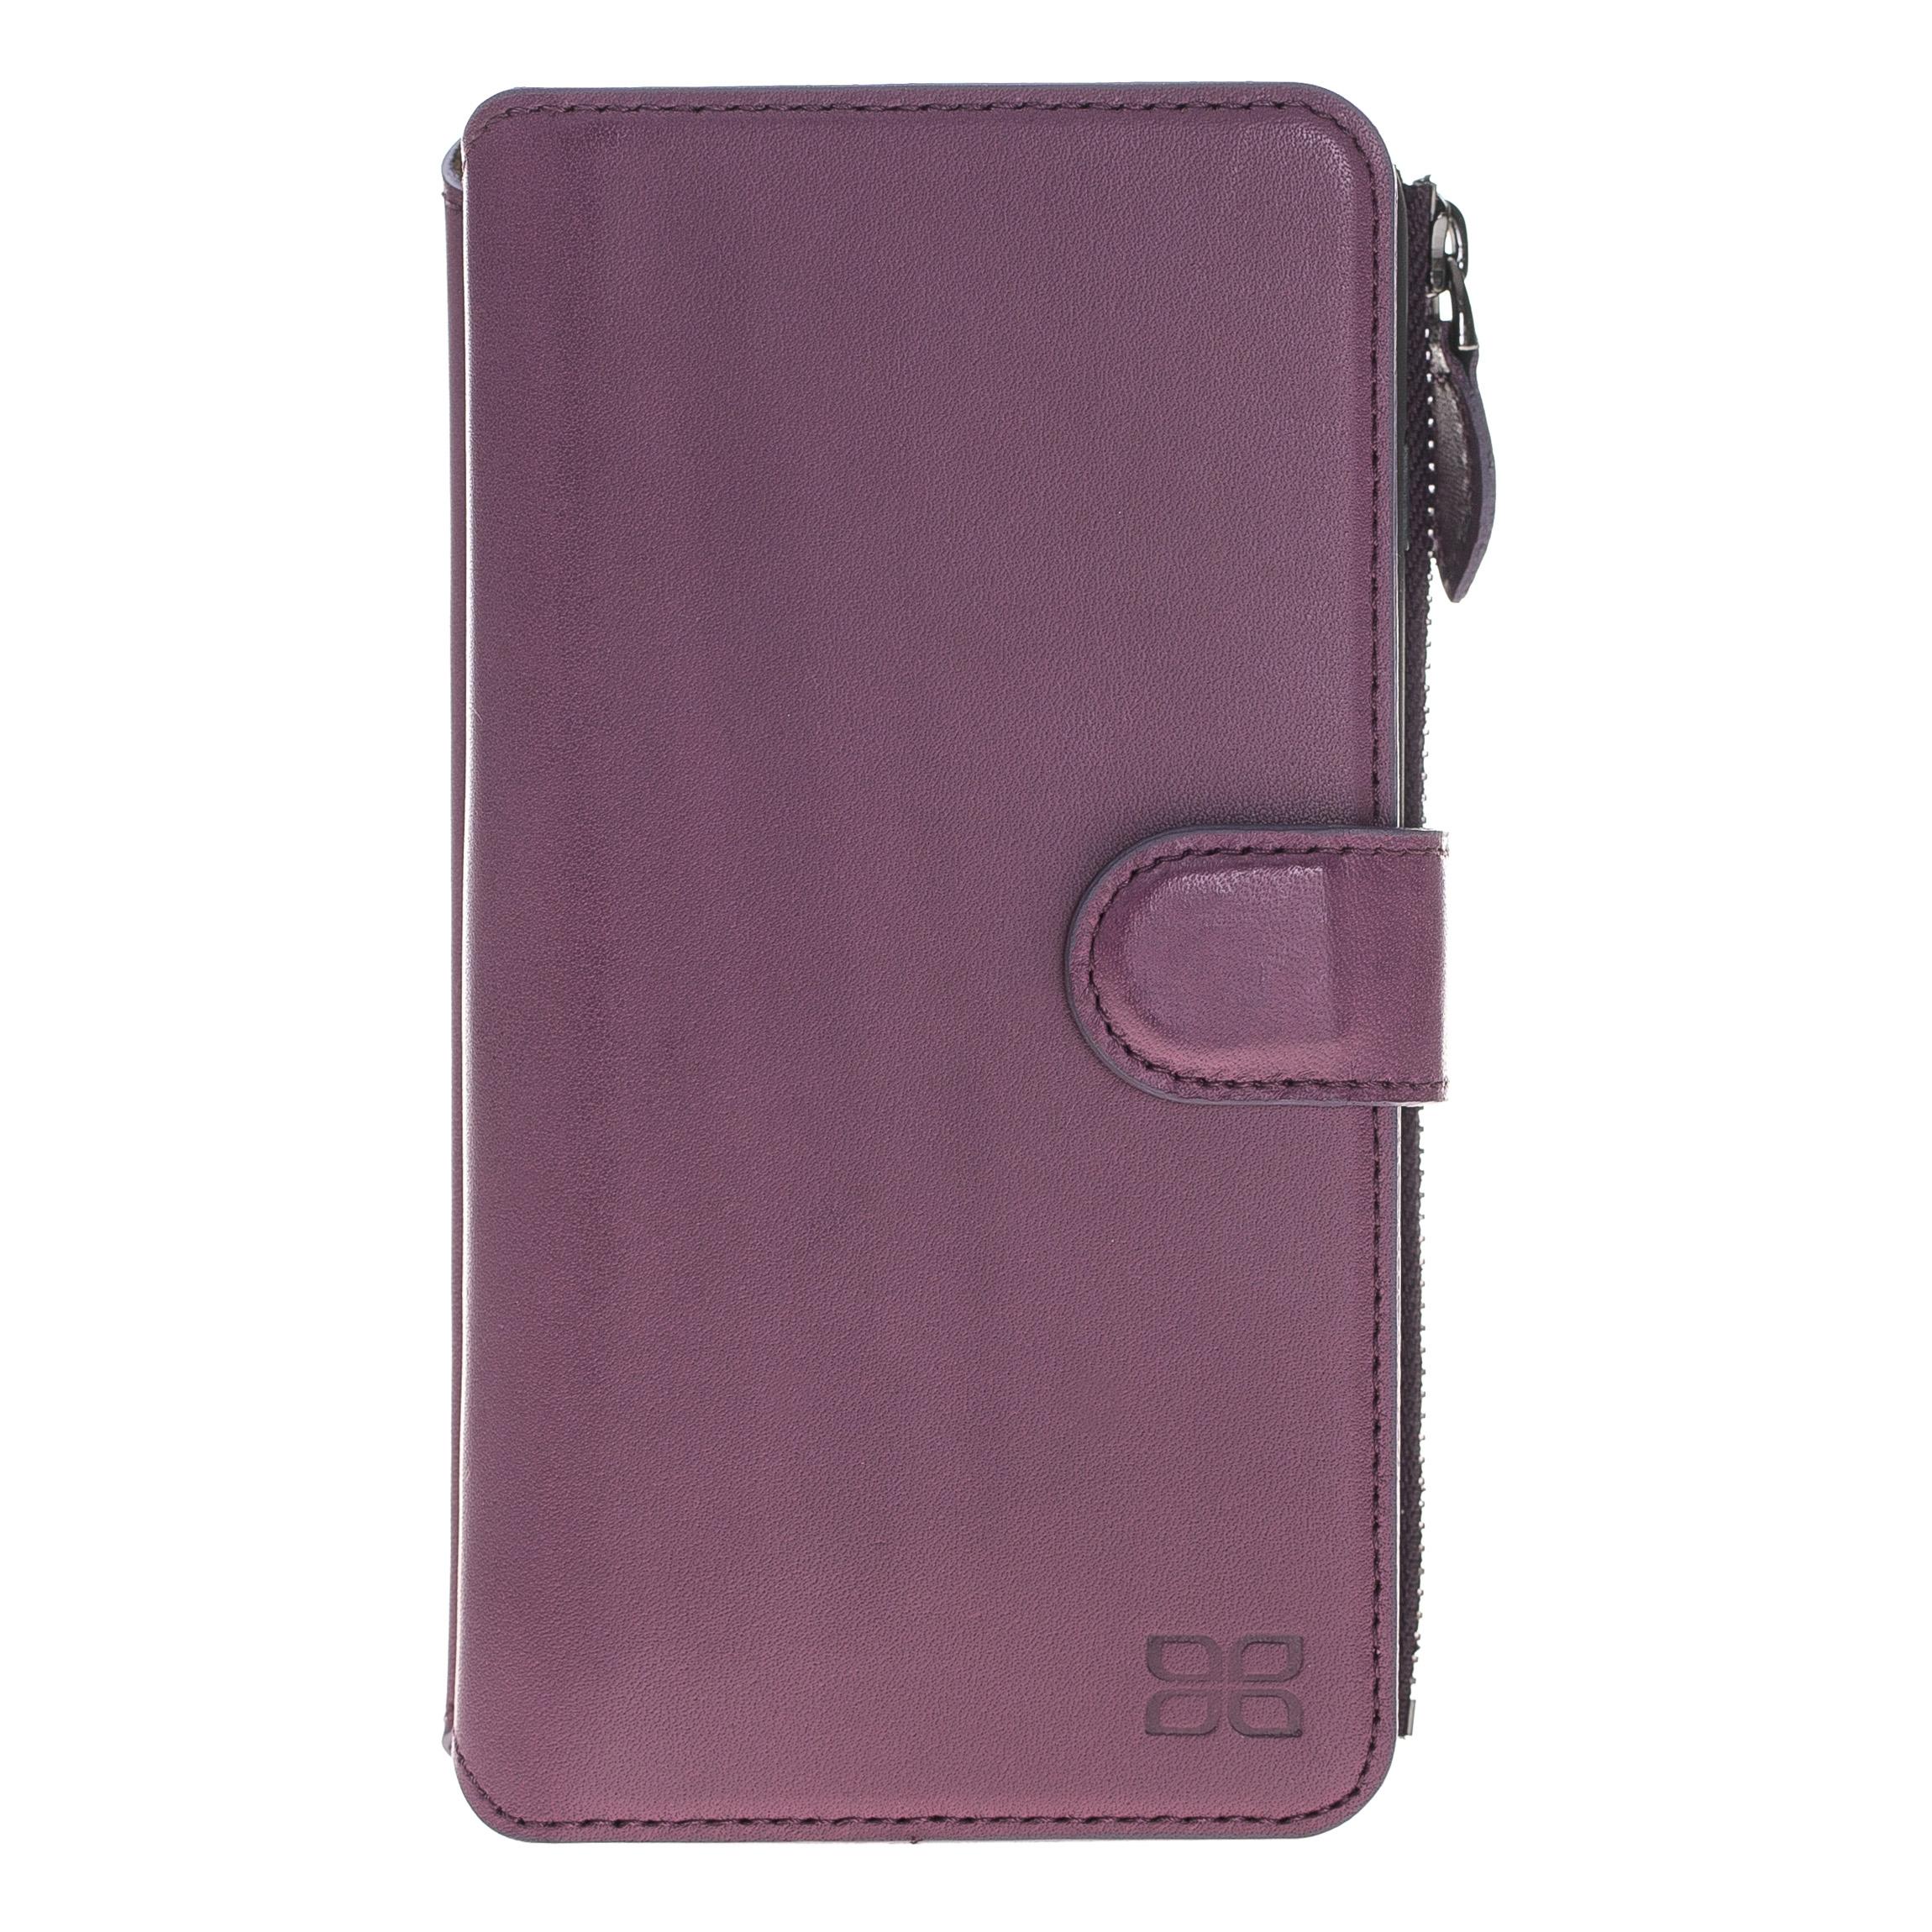 Чехол ZipMagic Wallet Bouletta Сиреневый BRN2 для Iphone 7/8 Plus